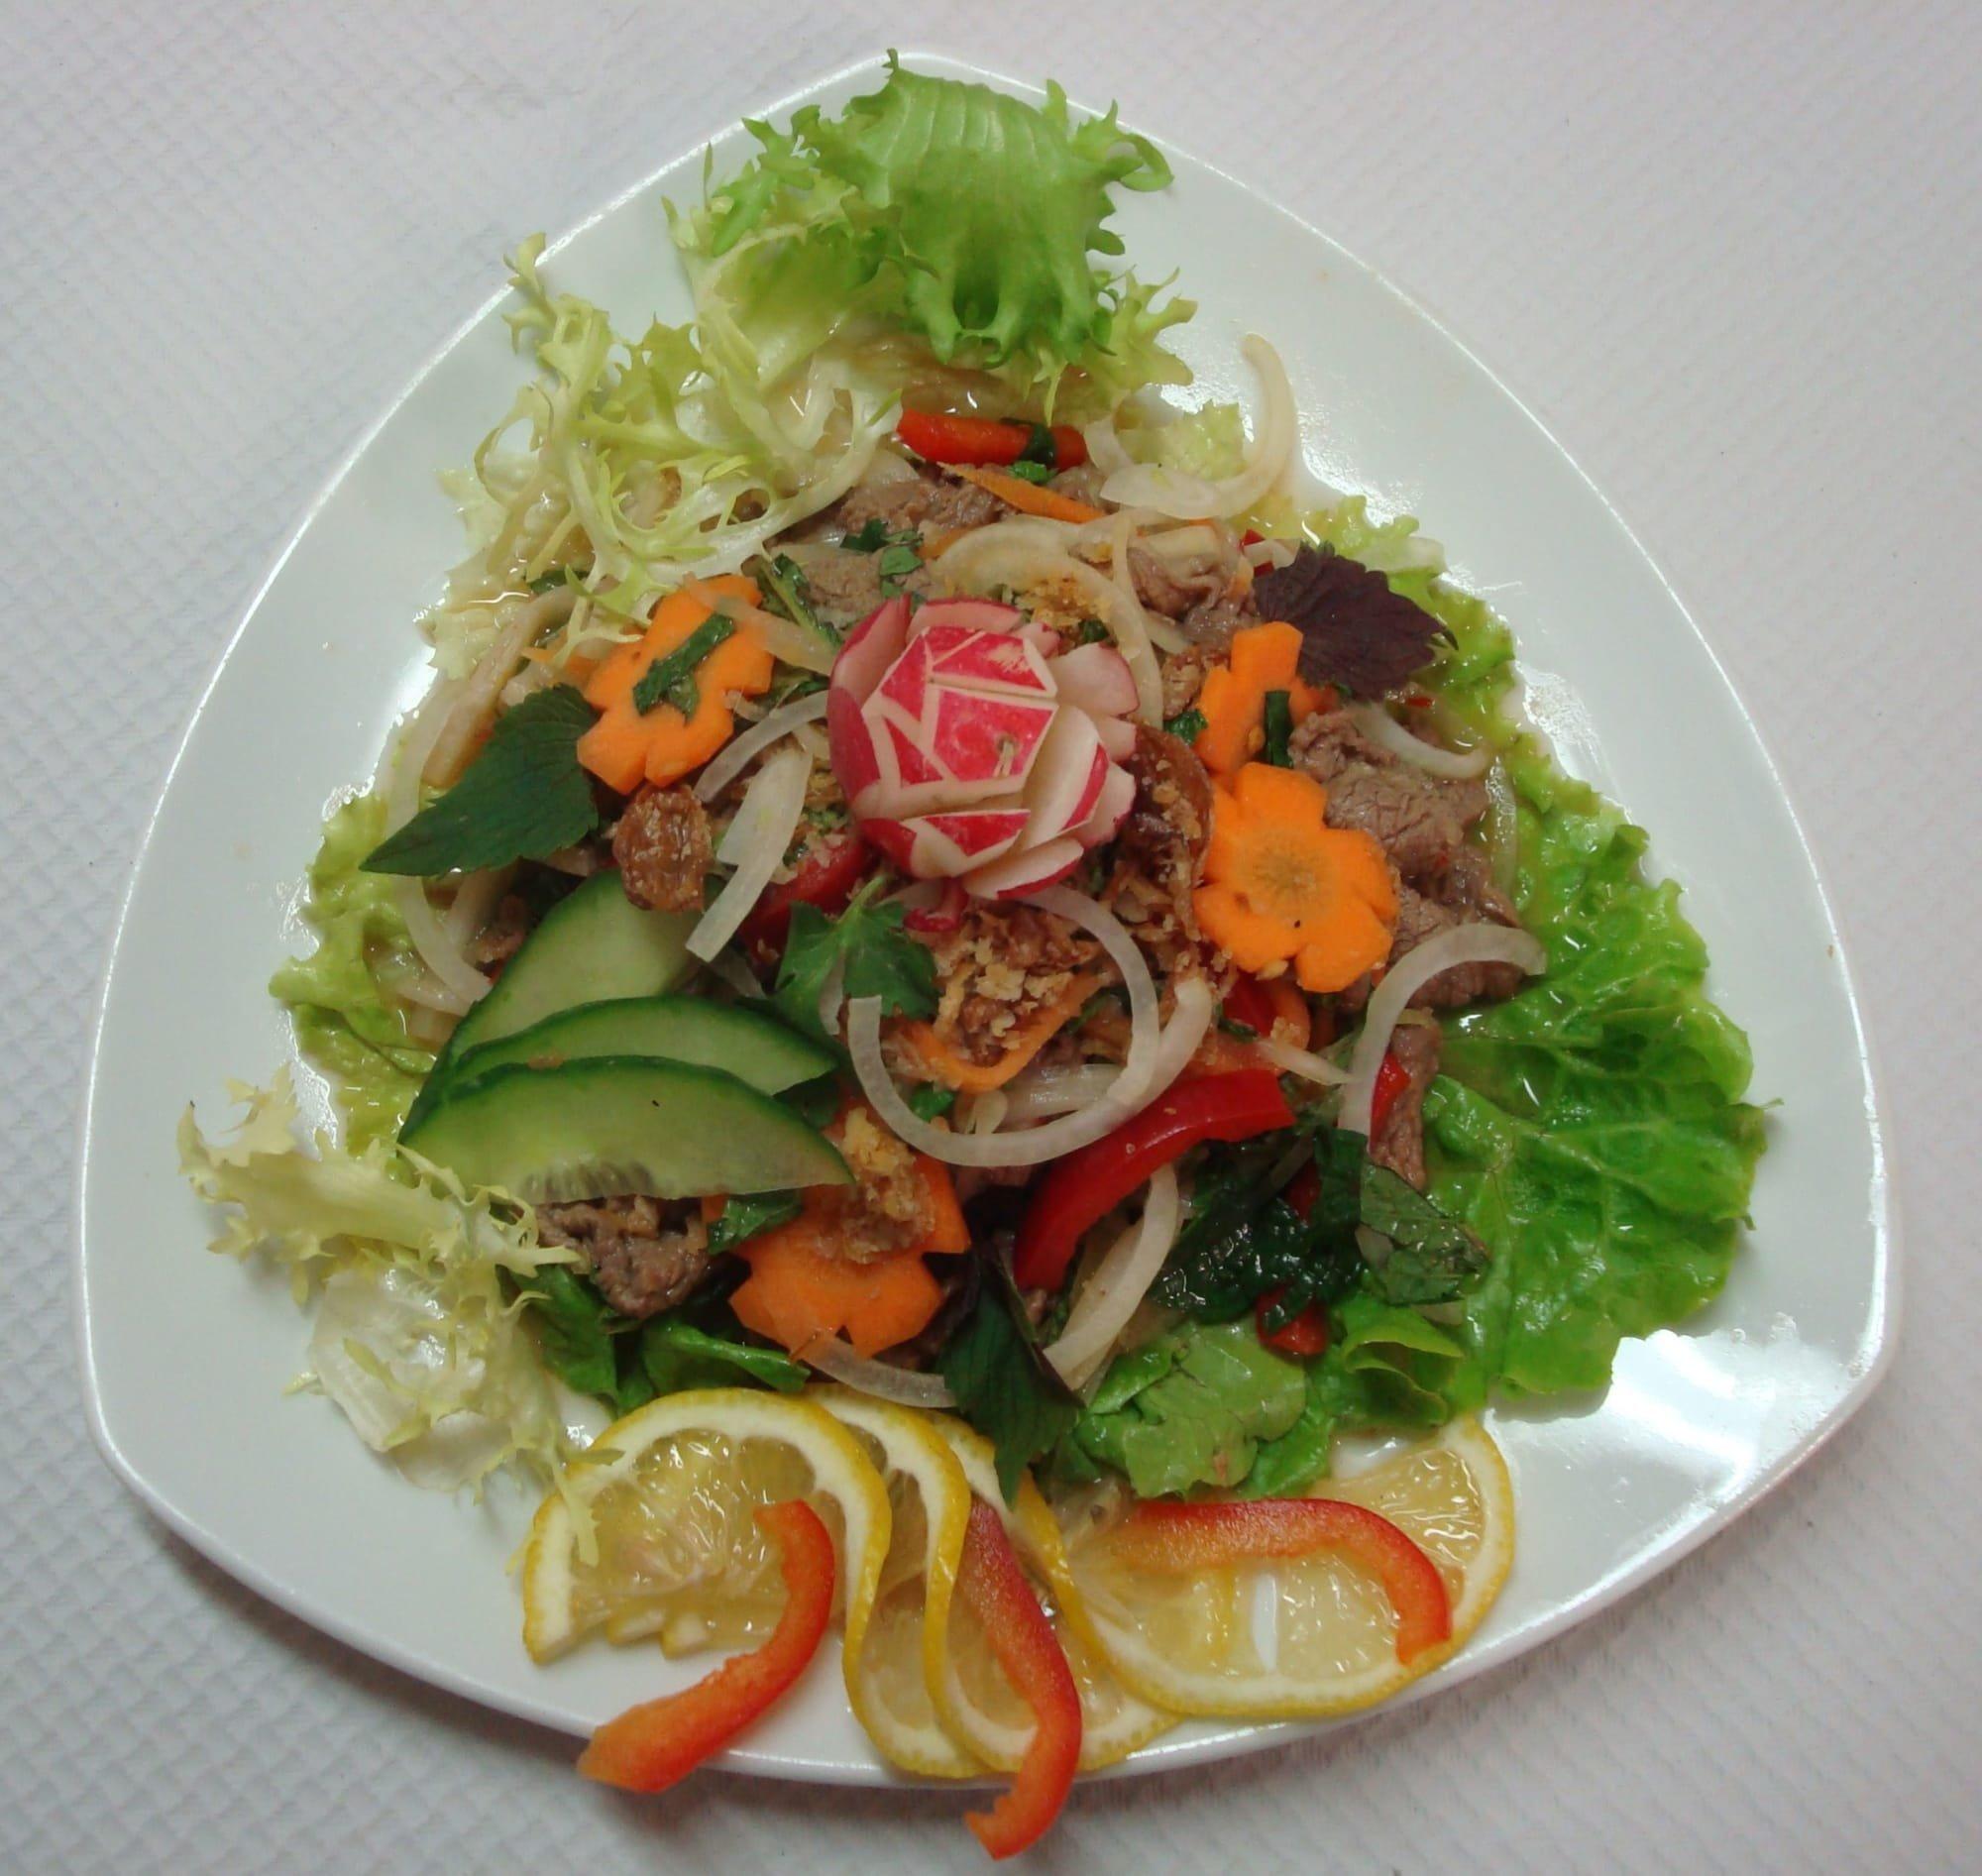 Cuisine Vietnamienne: Pacific Airport Restaurant